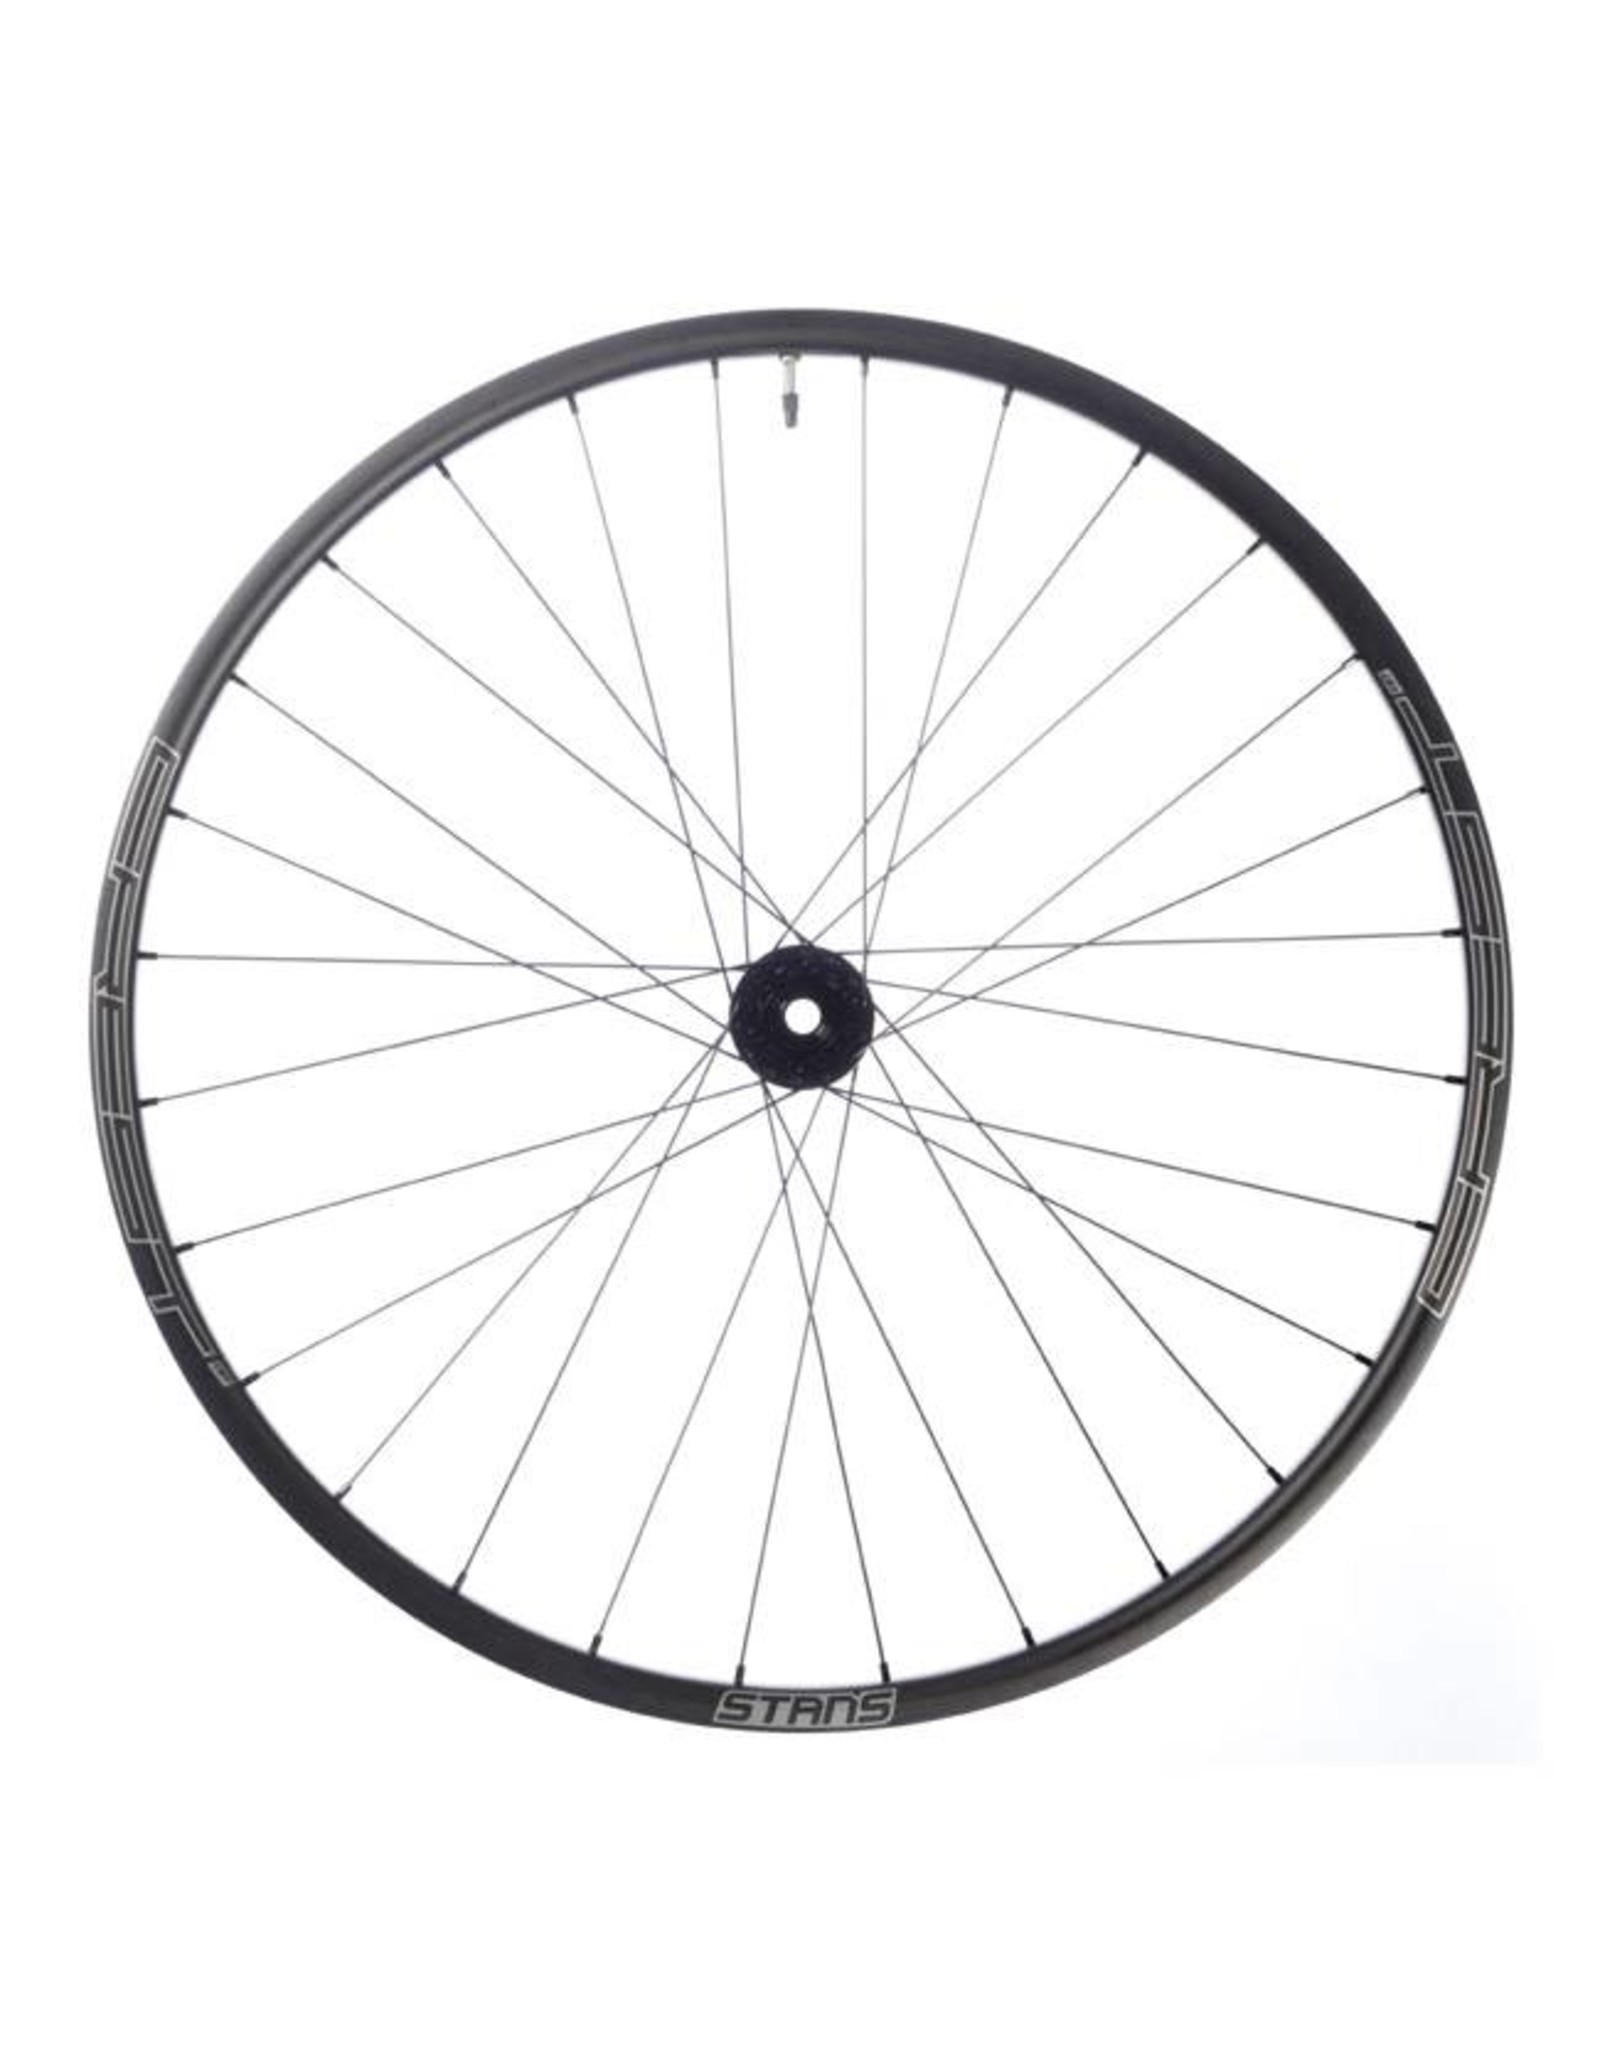 "Stan's No Tubes Stan's No Tubes Crest CB7 Rear Wheel: 29"" Carbon, 12 x 148mm Boost, Center Lock, Shimano Freehub, Black"